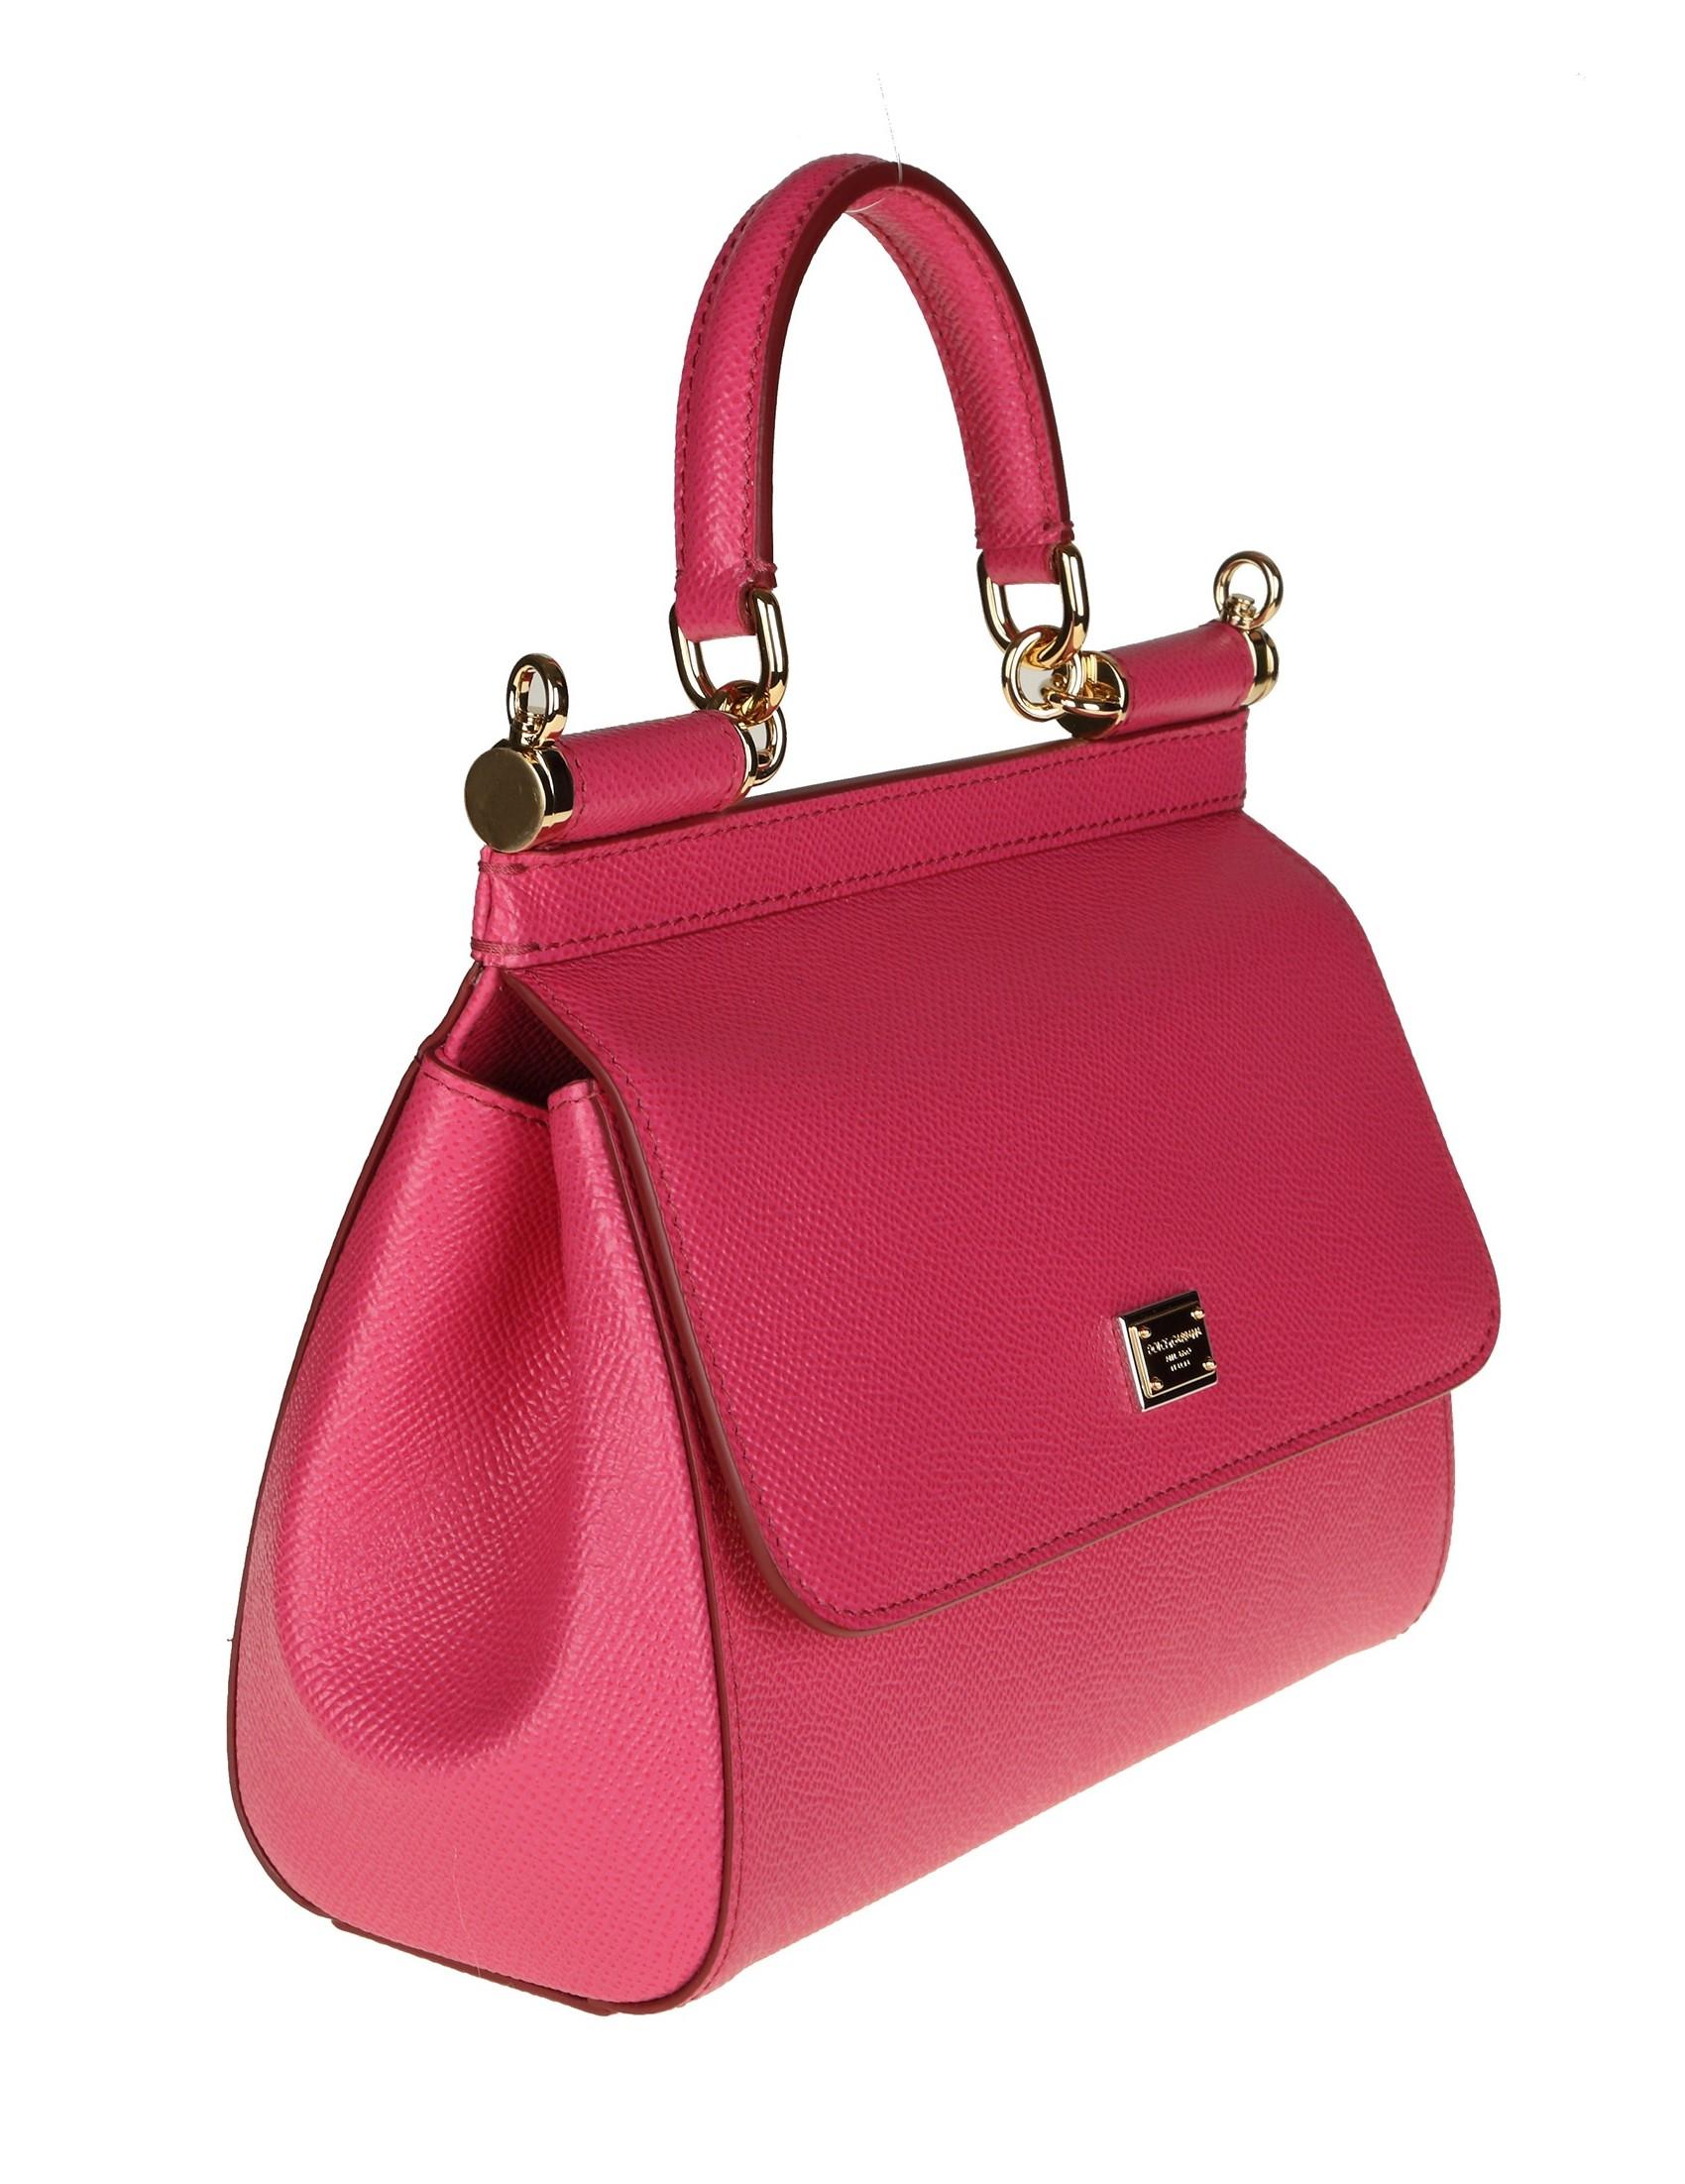 f5c66fbb91 Dolce Gabbana Hand Bag Sicily Leather Color Cyclamen Women S